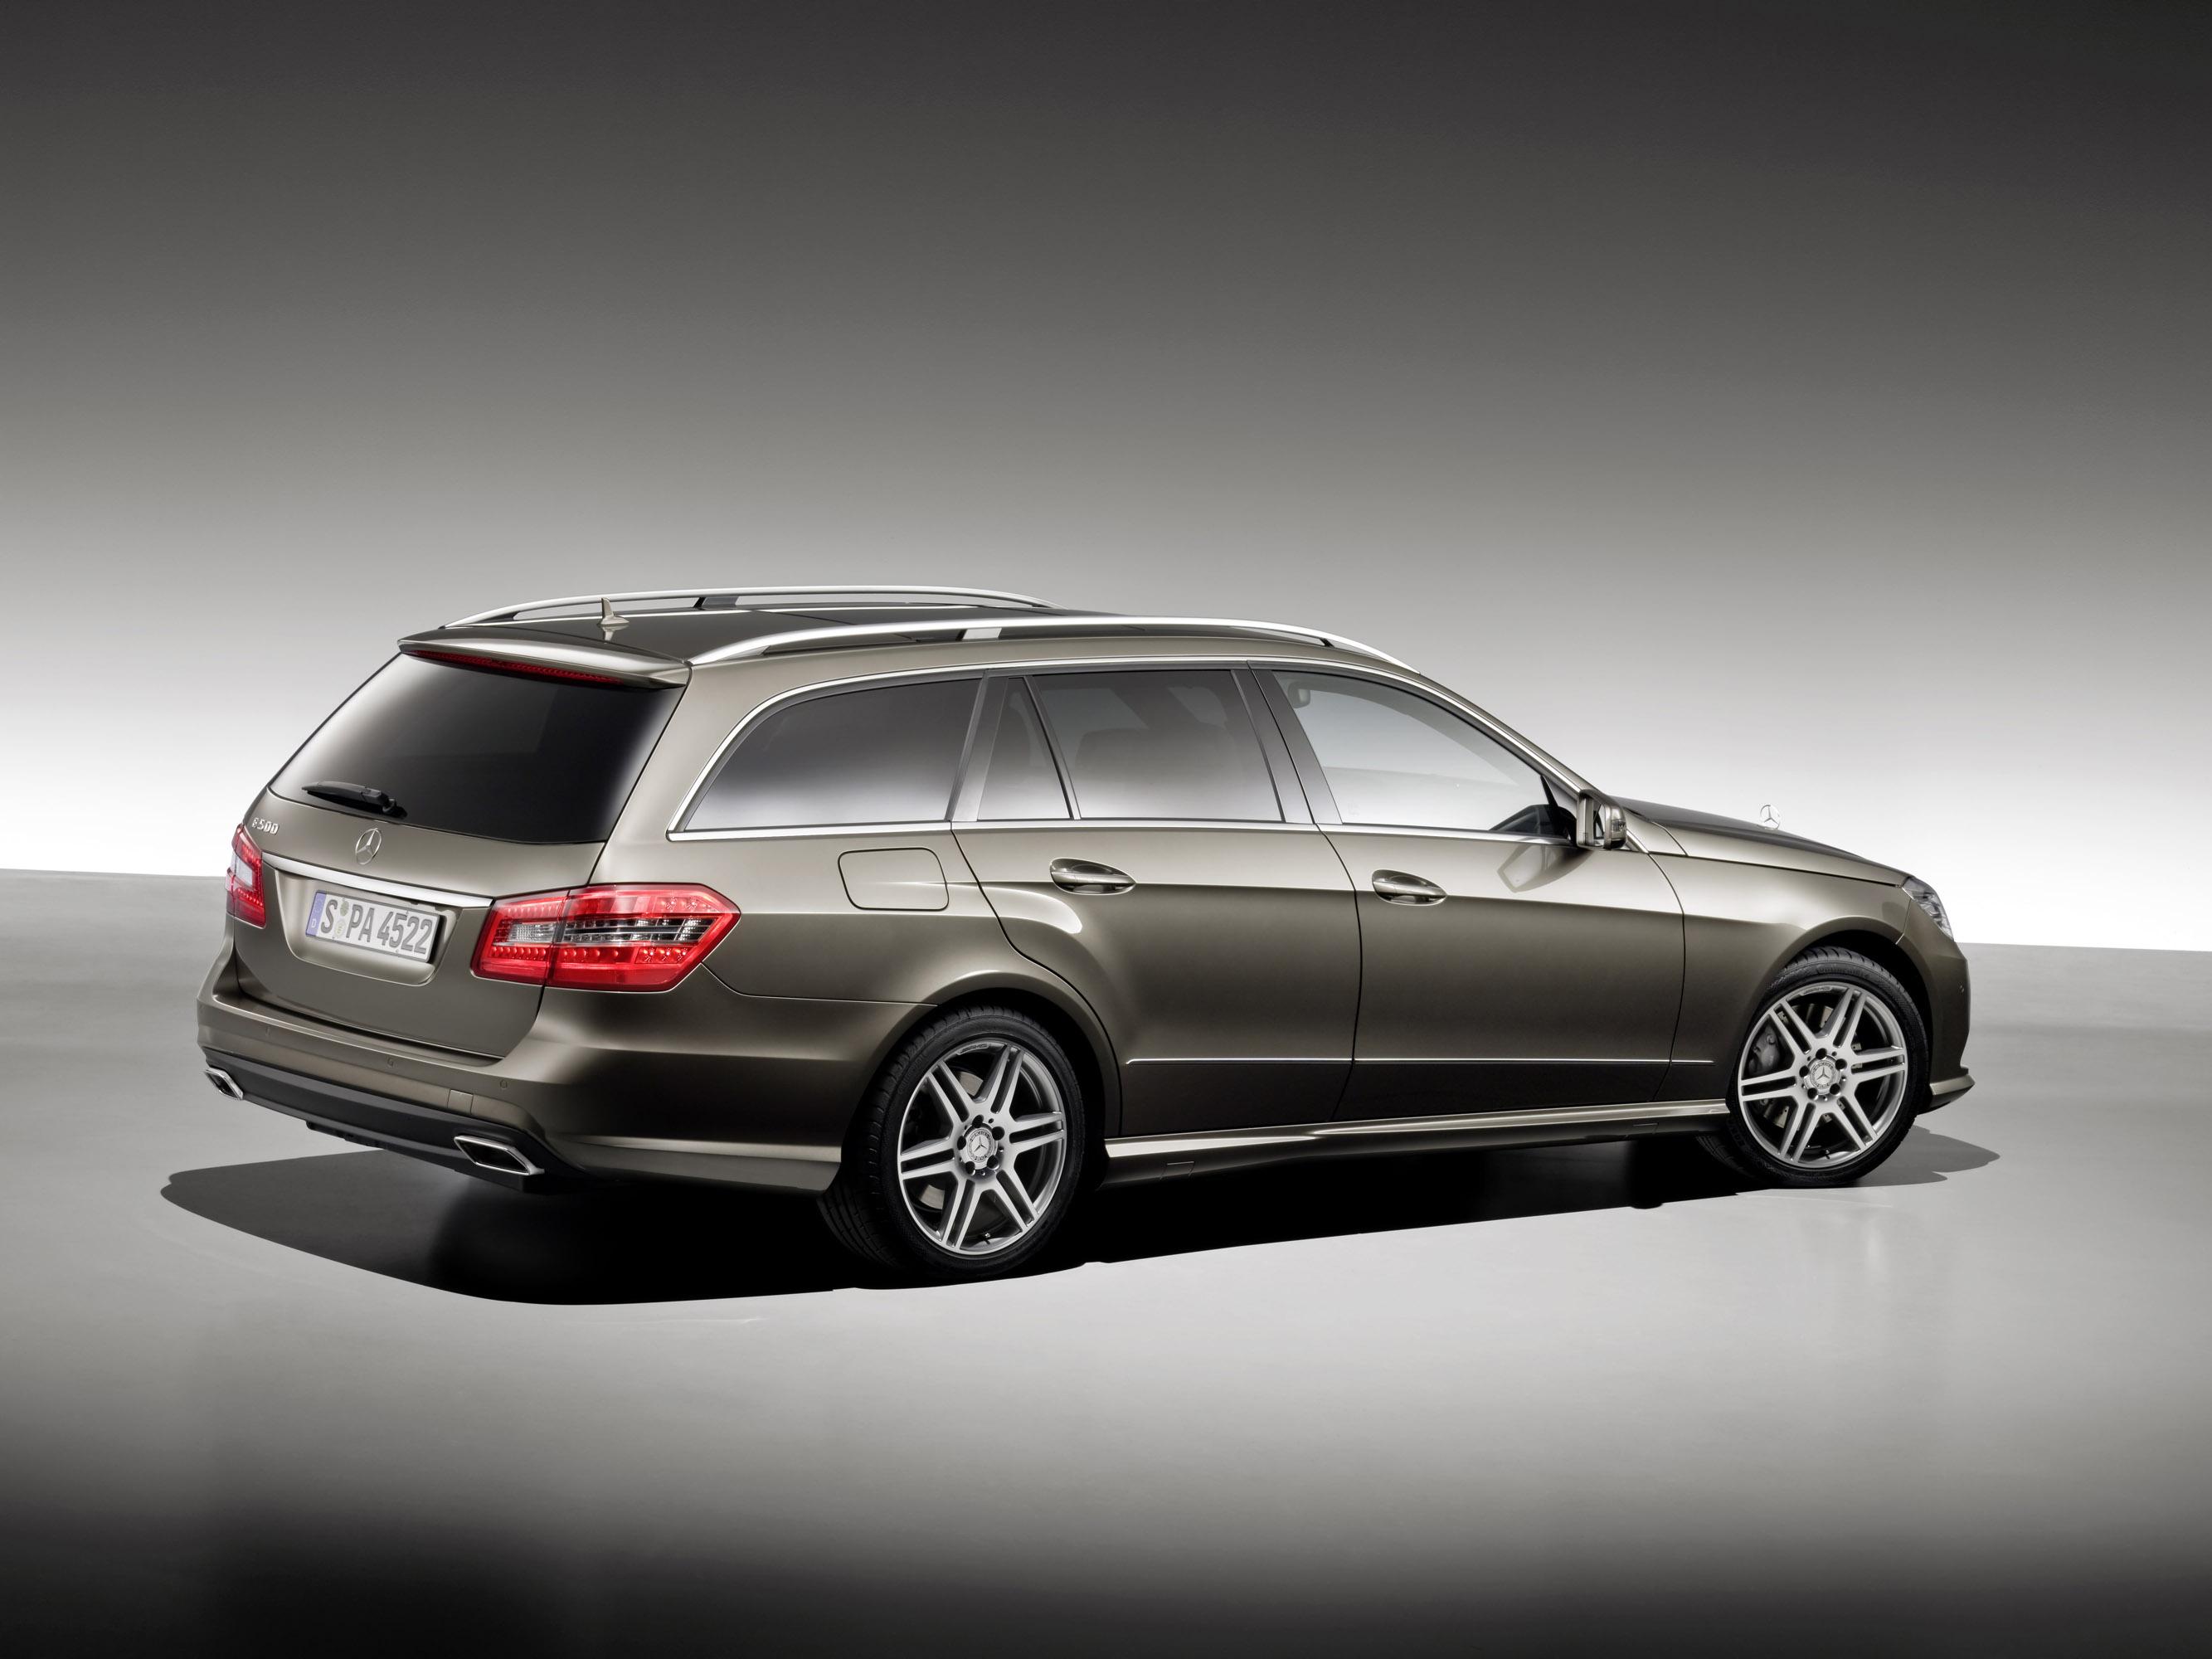 Mercedes-Benz E-Class Универсал - фотография №48